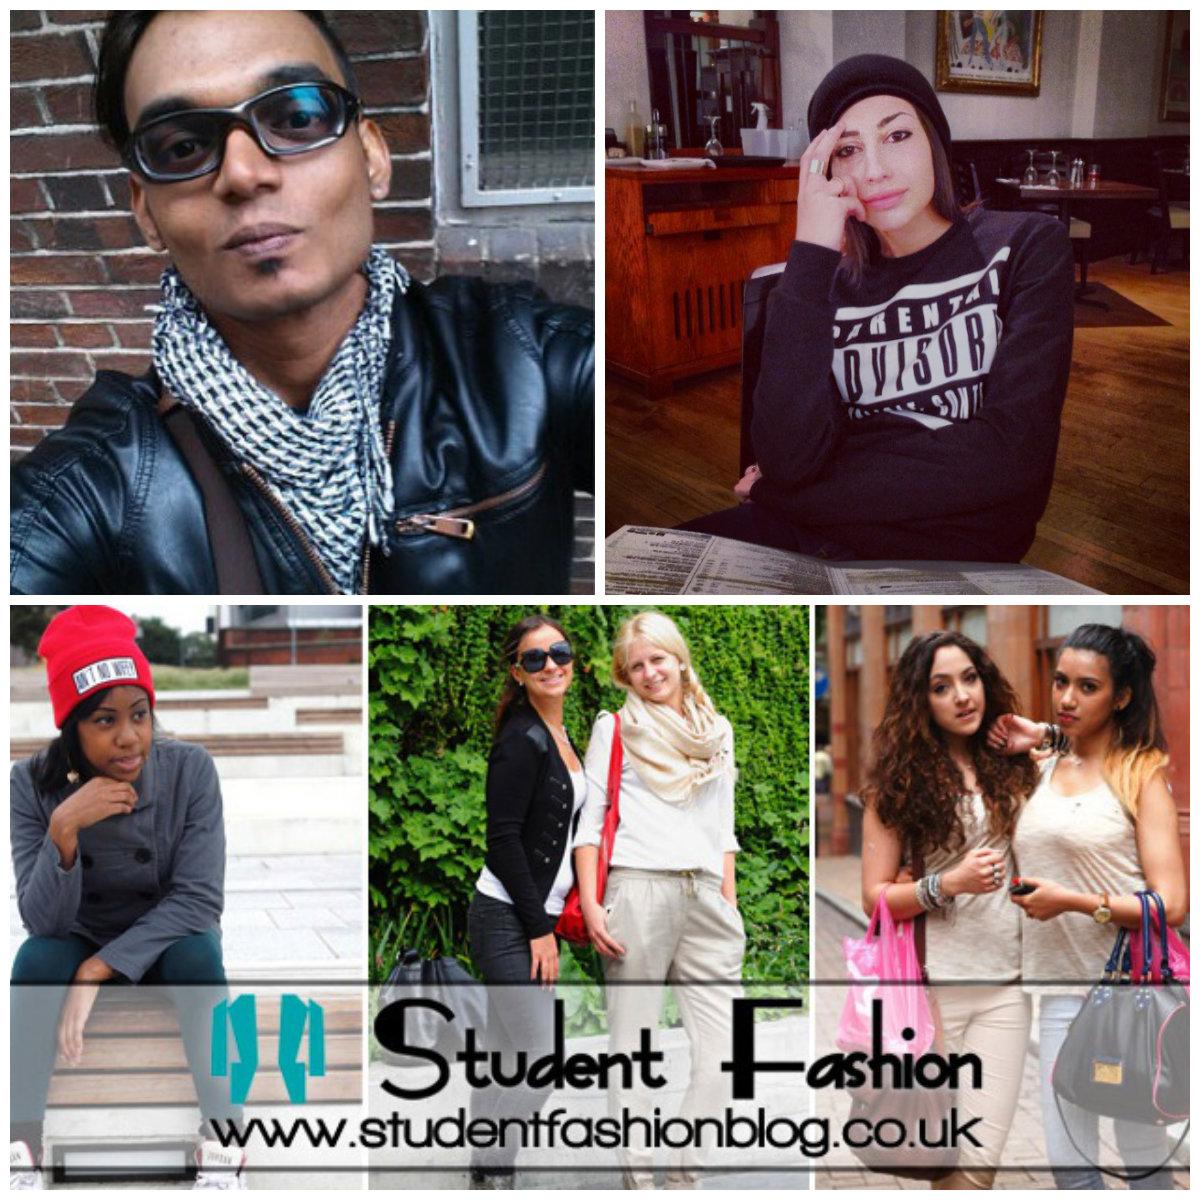 Student Fashion announcement image